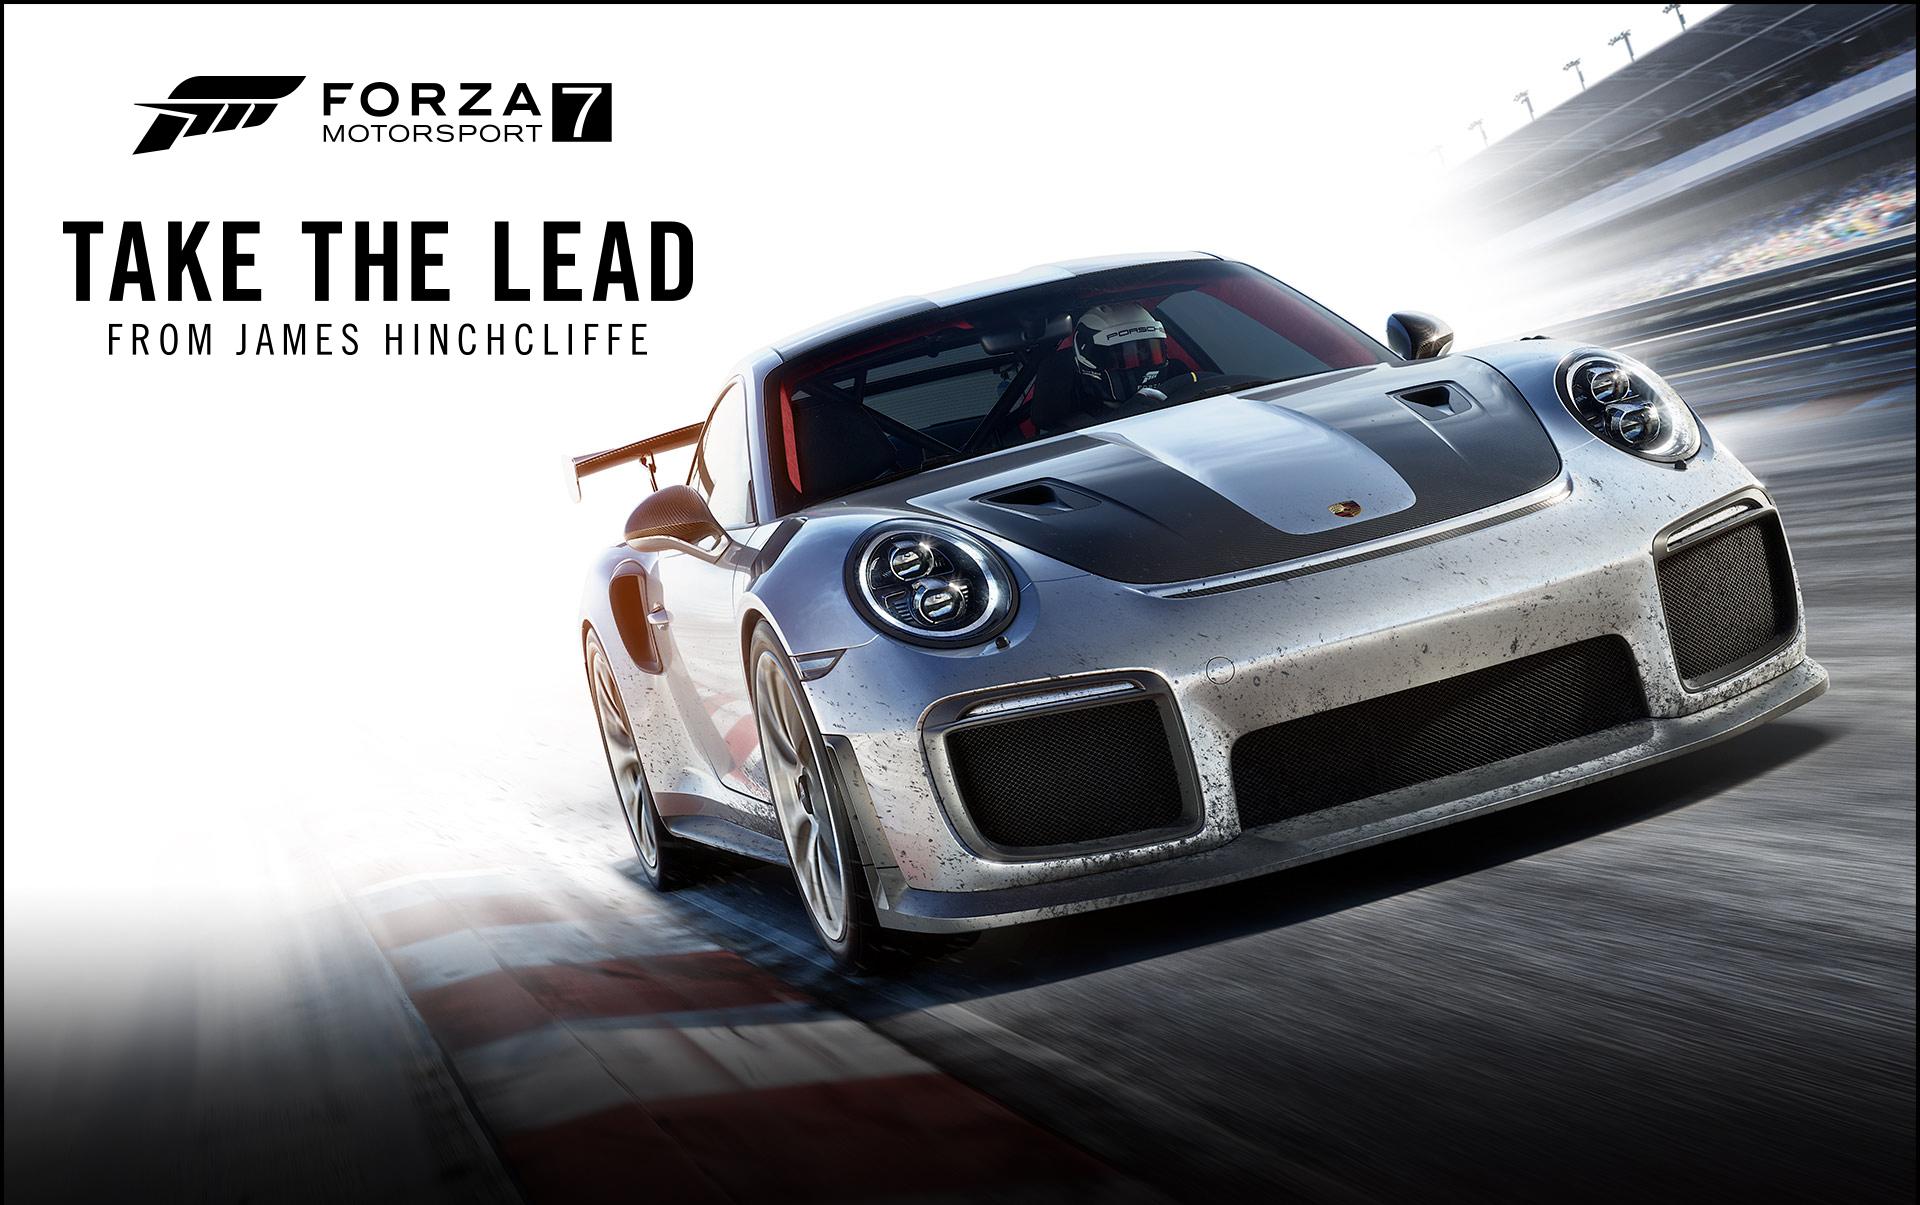 39010b6d-a79b-43e2-8da6-482e115789c2.jpg?n=Hero Remarkable Porsche 911 Gt2 Xbox 360 Cars Trend